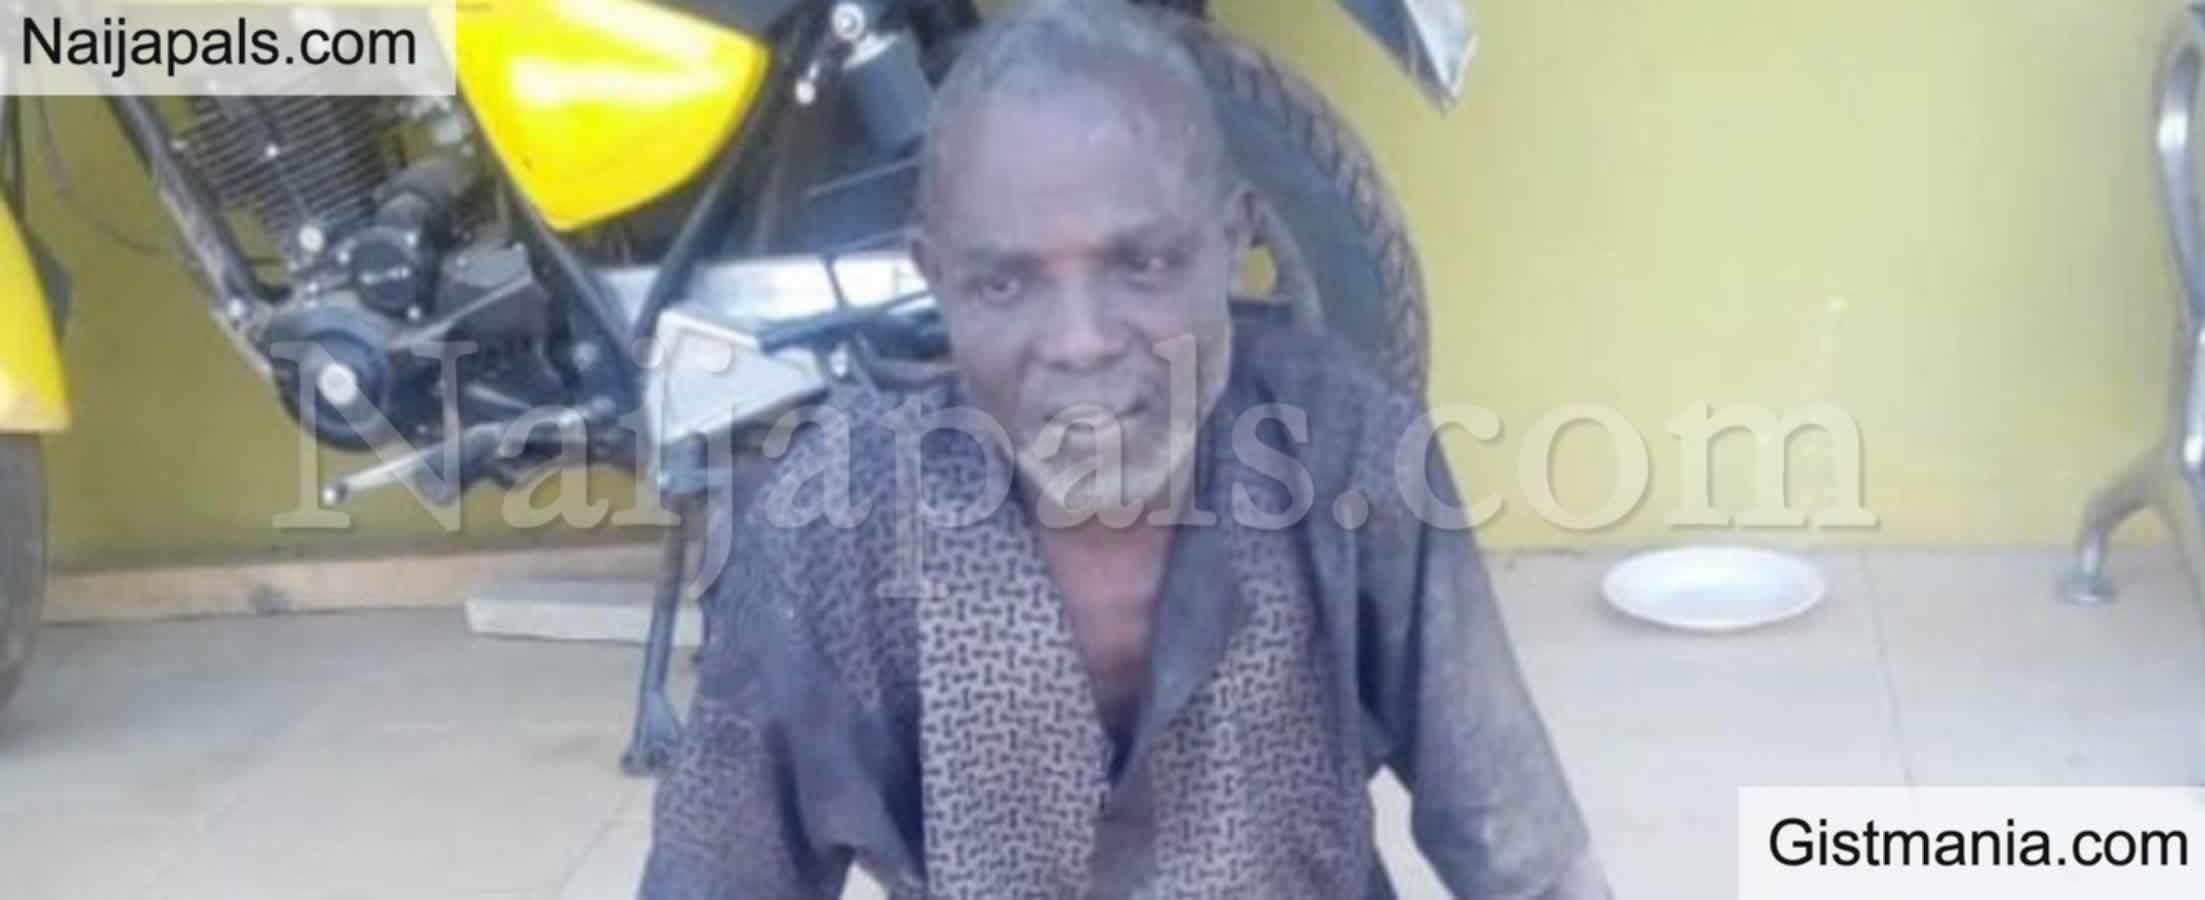 <img alt='.' class='lazyload' data-src='https://img.gistmania.com/emot/shocked.gif' /> <b>55Yrs Old Yesiru Salisu Found With 4 Human Skulls, 3 Jaws & 2 Dry Head Arrested In Ogun</b>